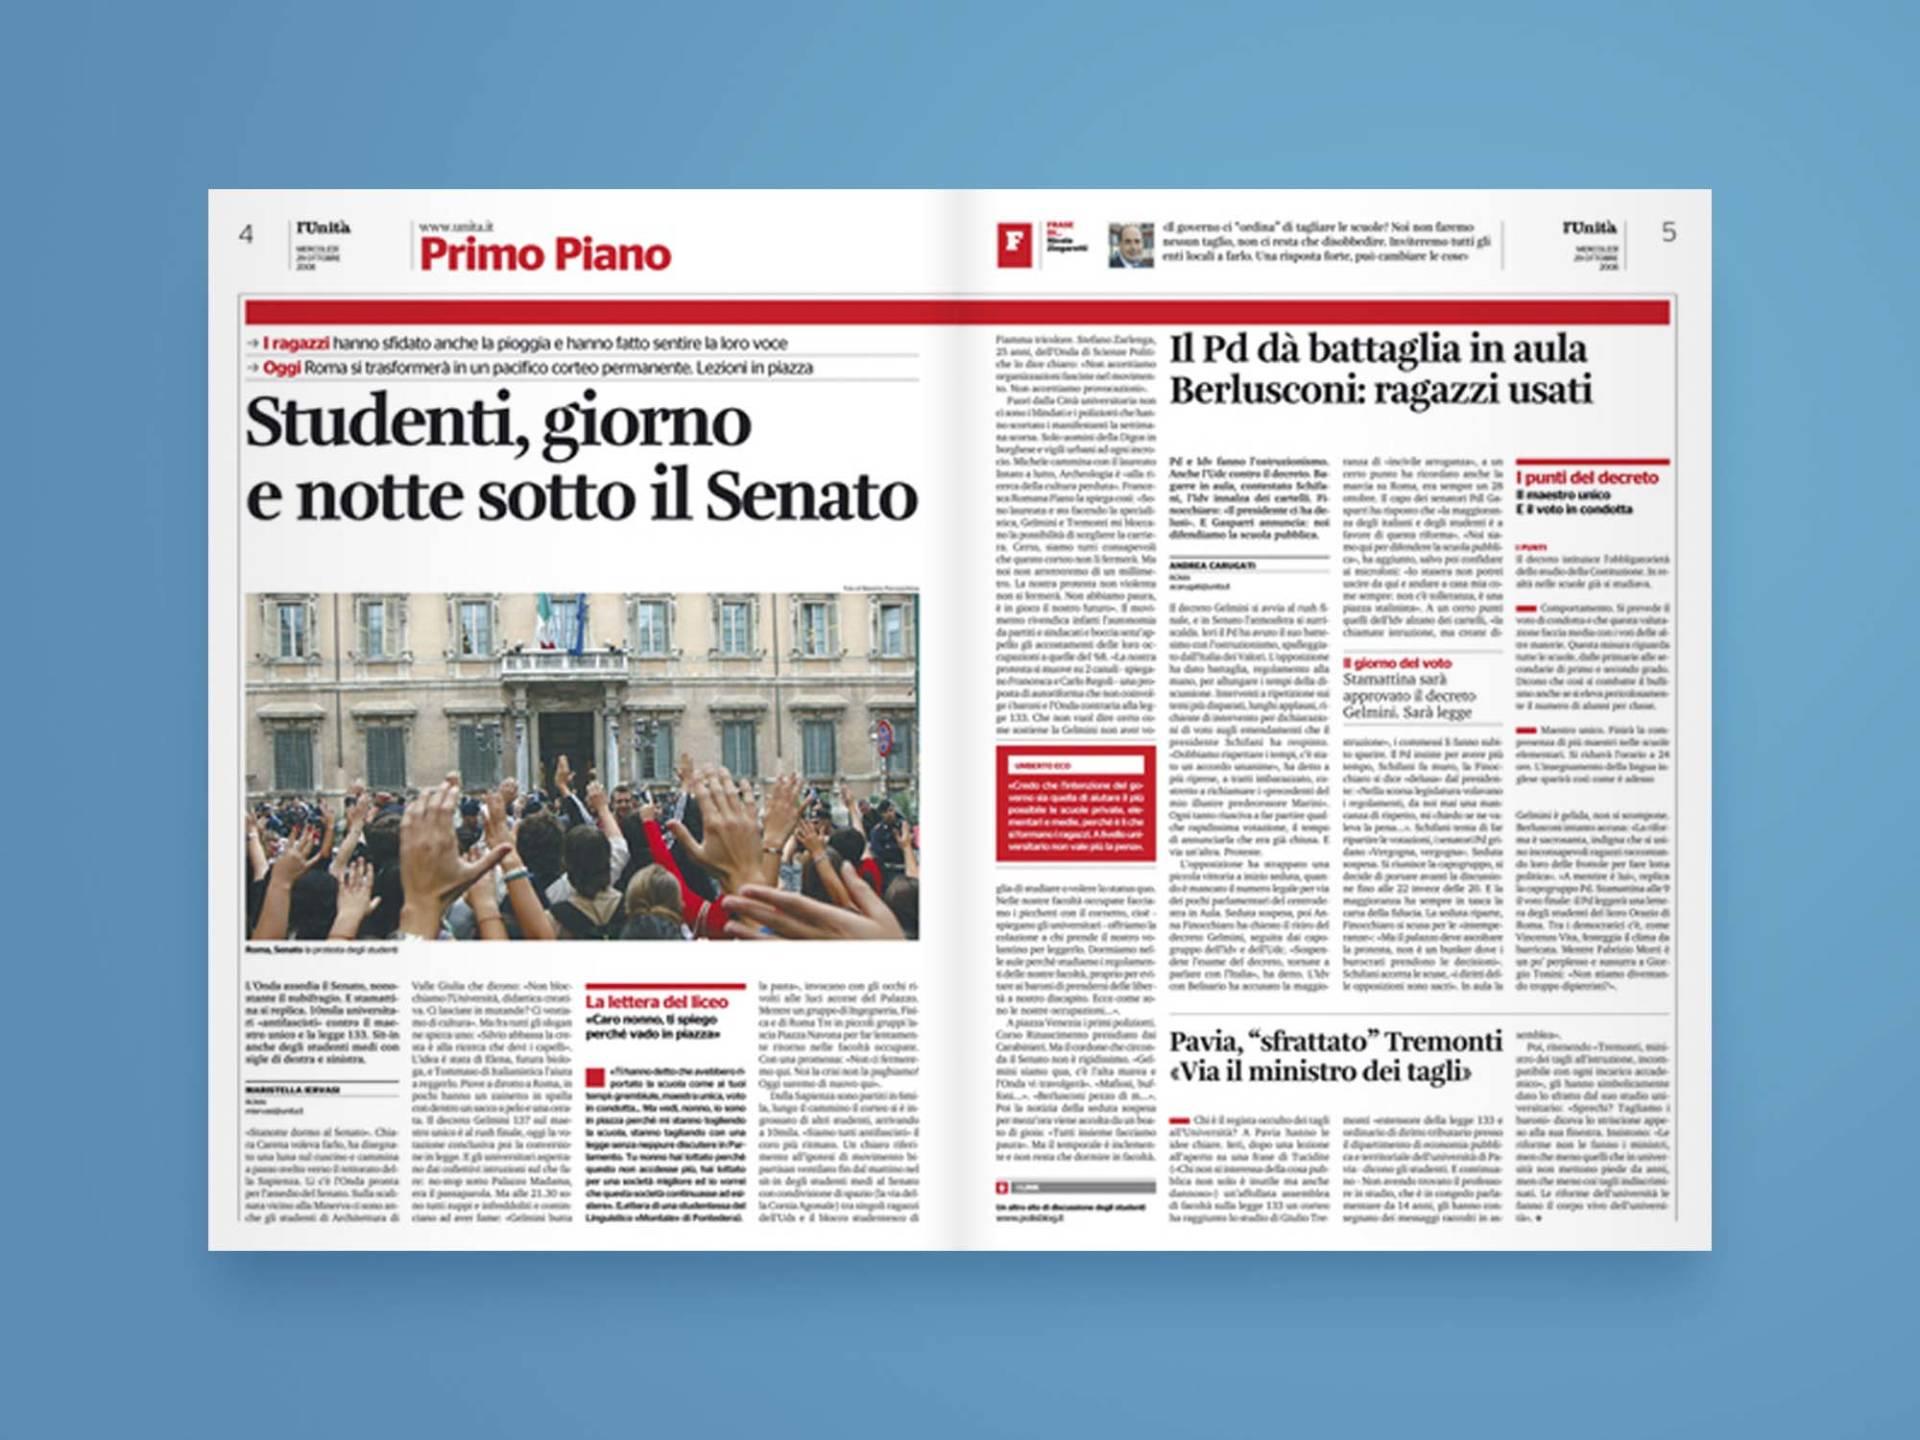 L'Unità_05_Wenceslau_News_Design